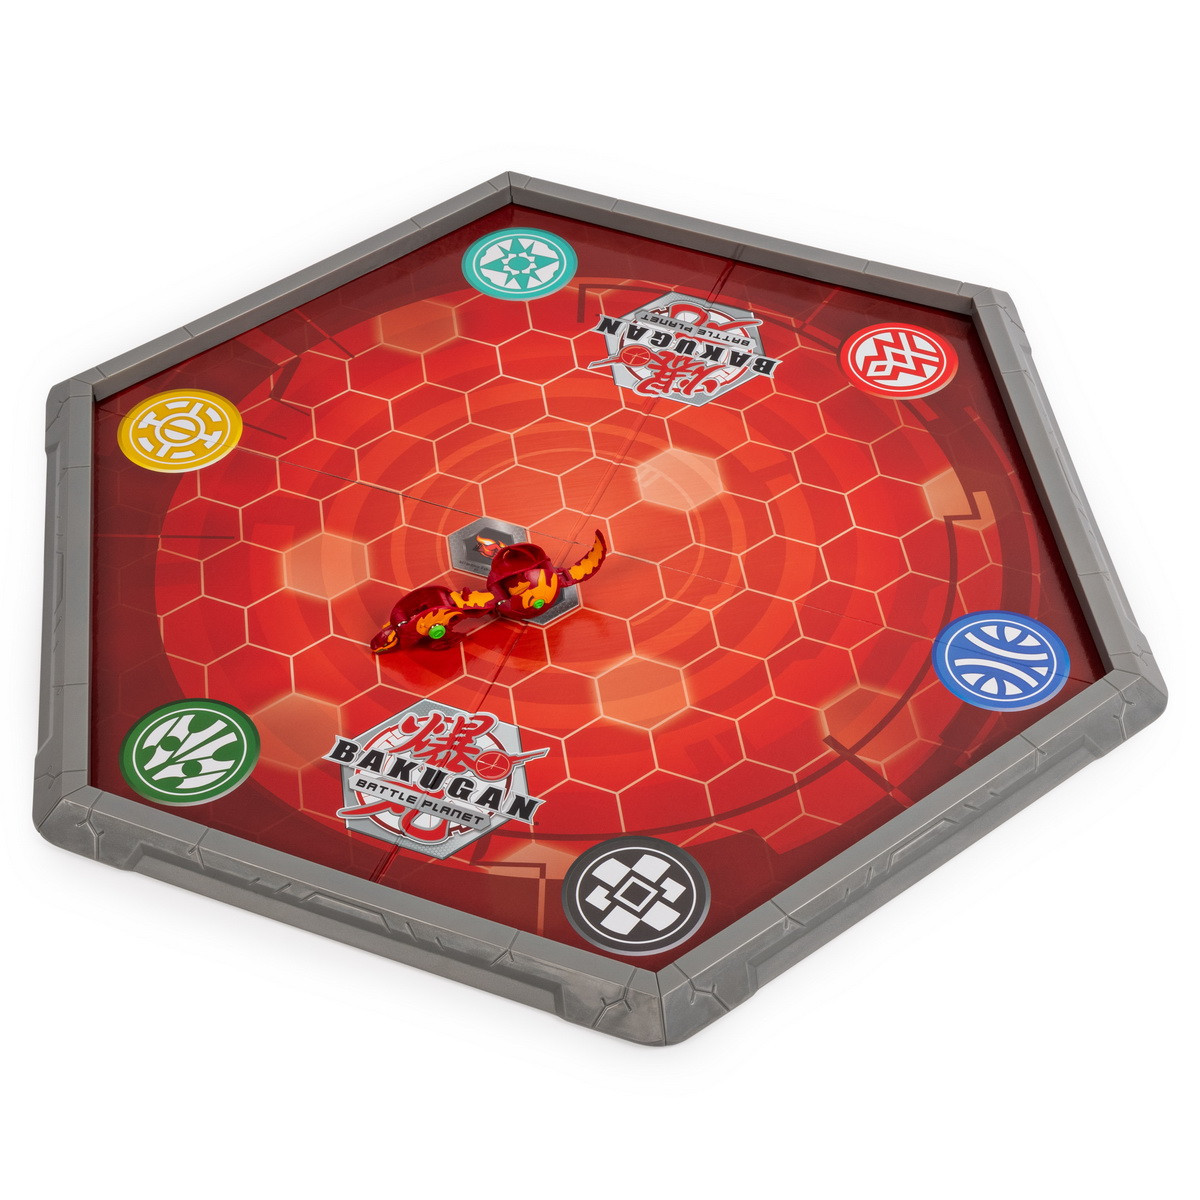 Bakugan Battle Planet Боевая арена, SM64427